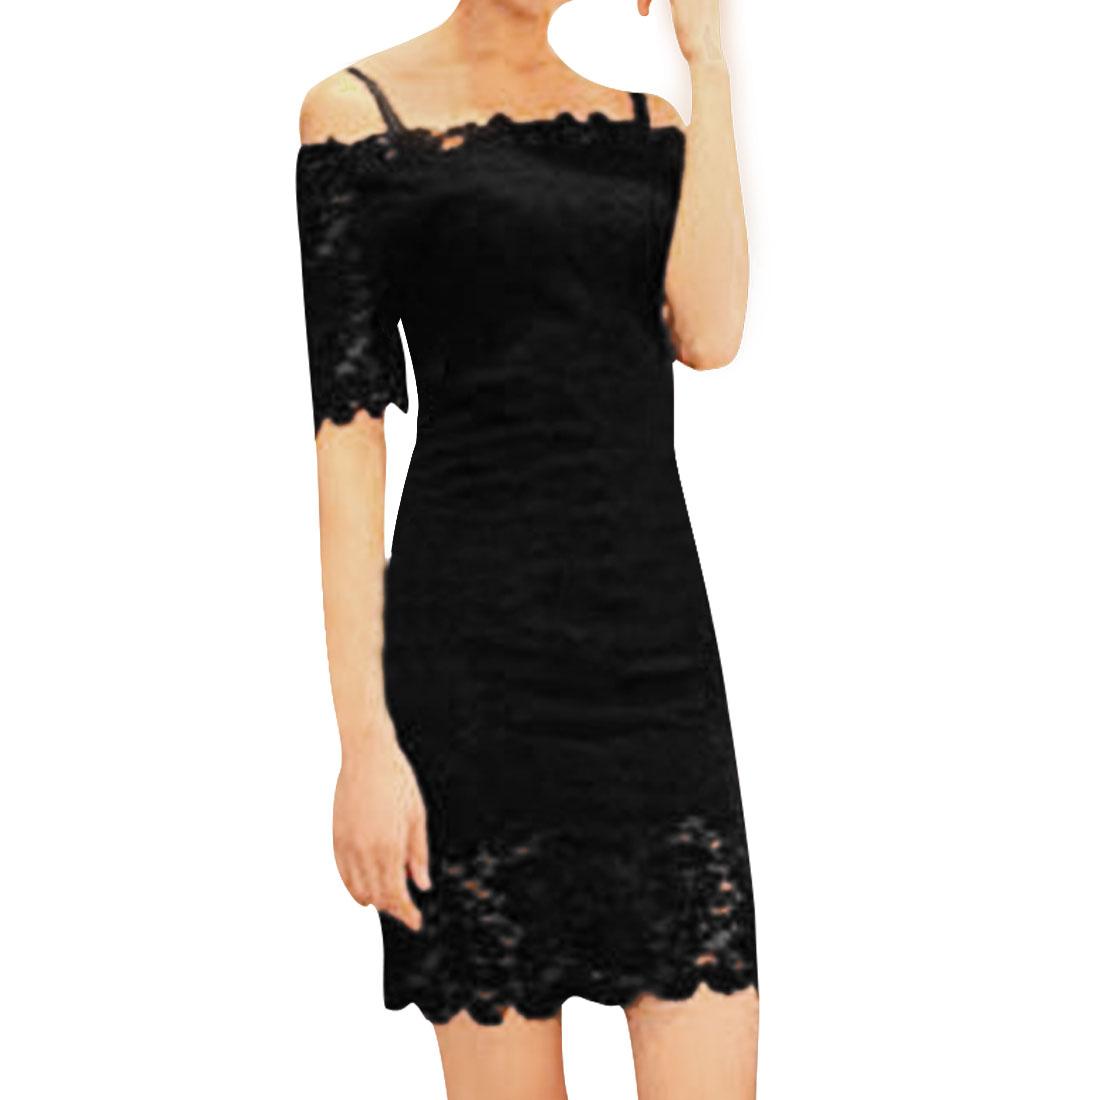 Girls Off Shoulder Short Sleeve Semi-Sheer Lace Sheath Dress